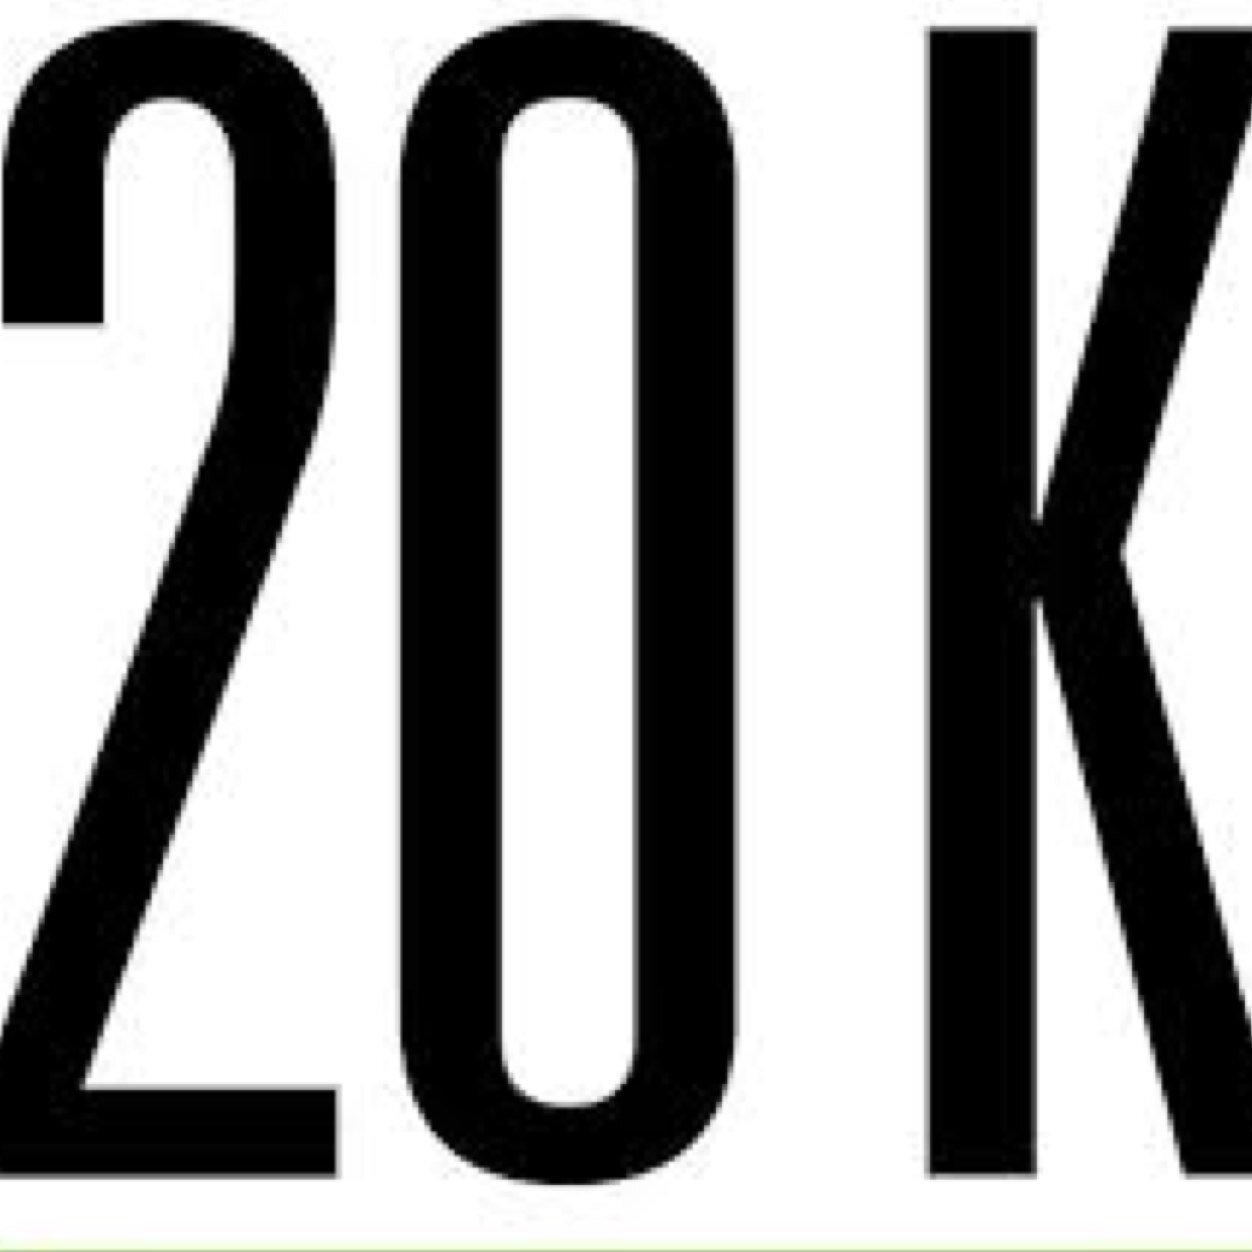 20k goal 20kfollowergoal twitter